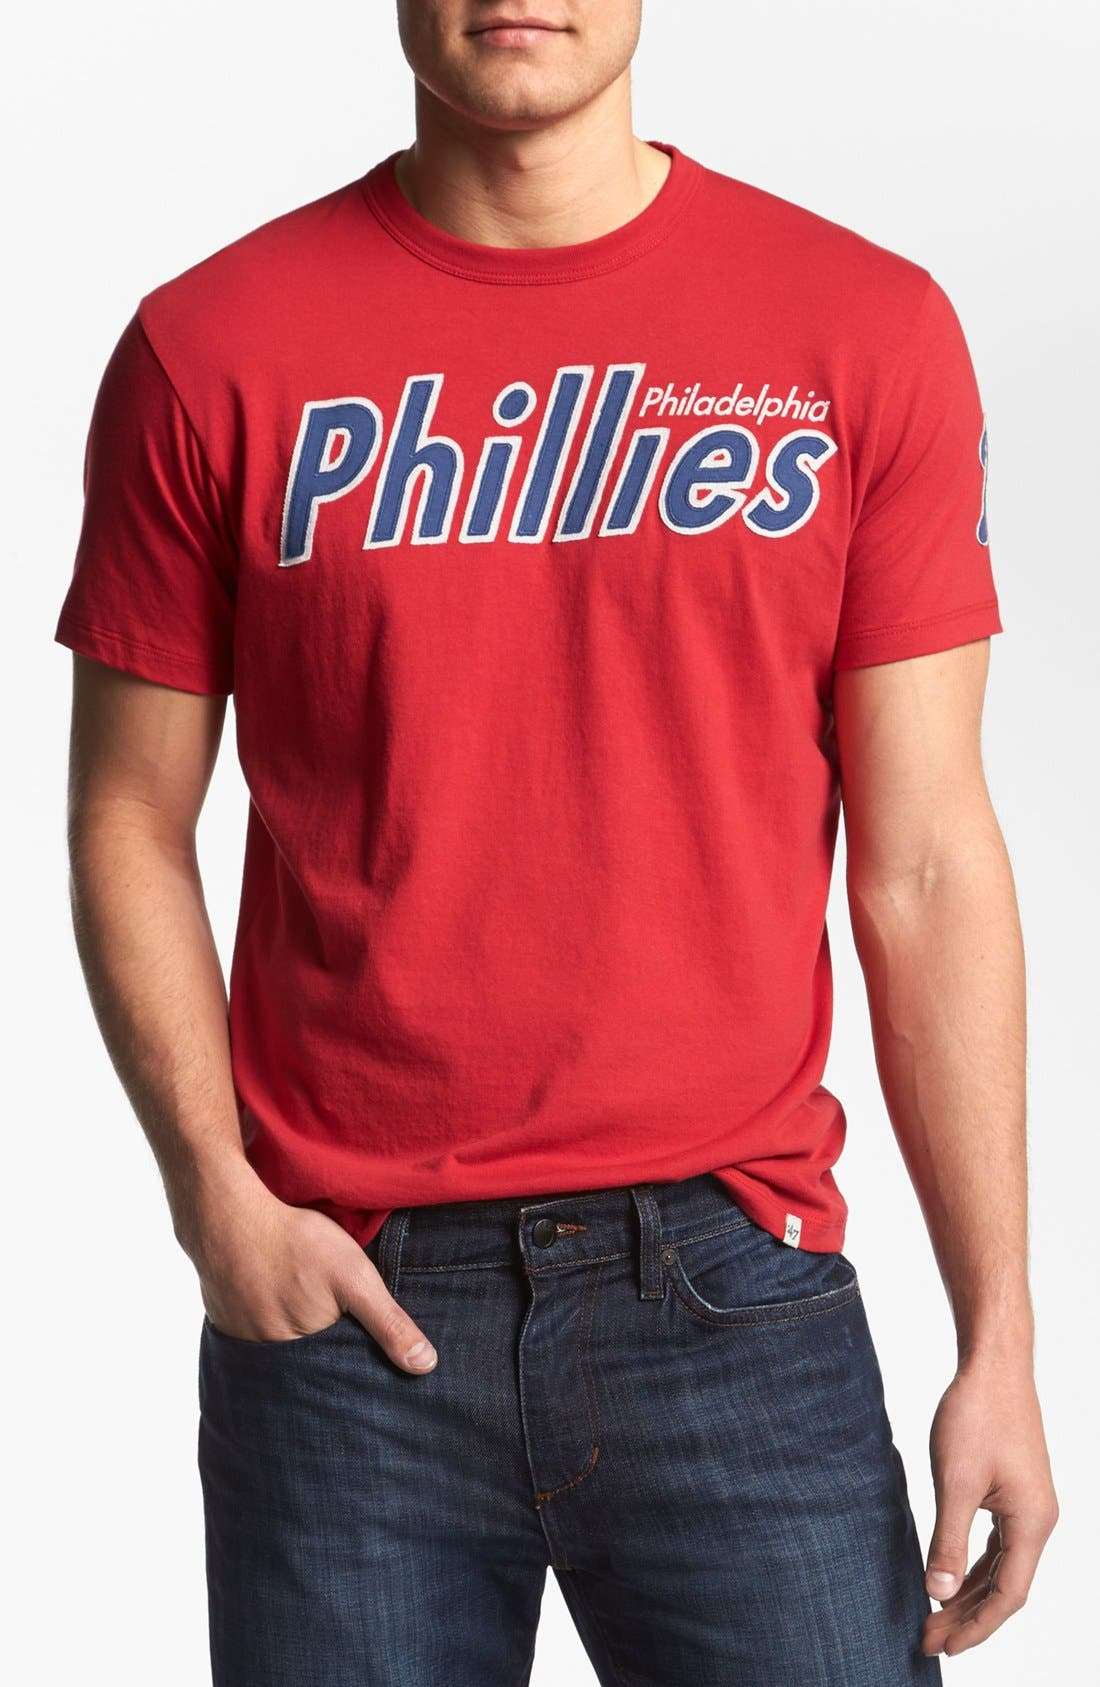 Alternate Image 1 Selected - 47 Brand 'Philadelphia Phillies - Fieldhouse' T-Shirt